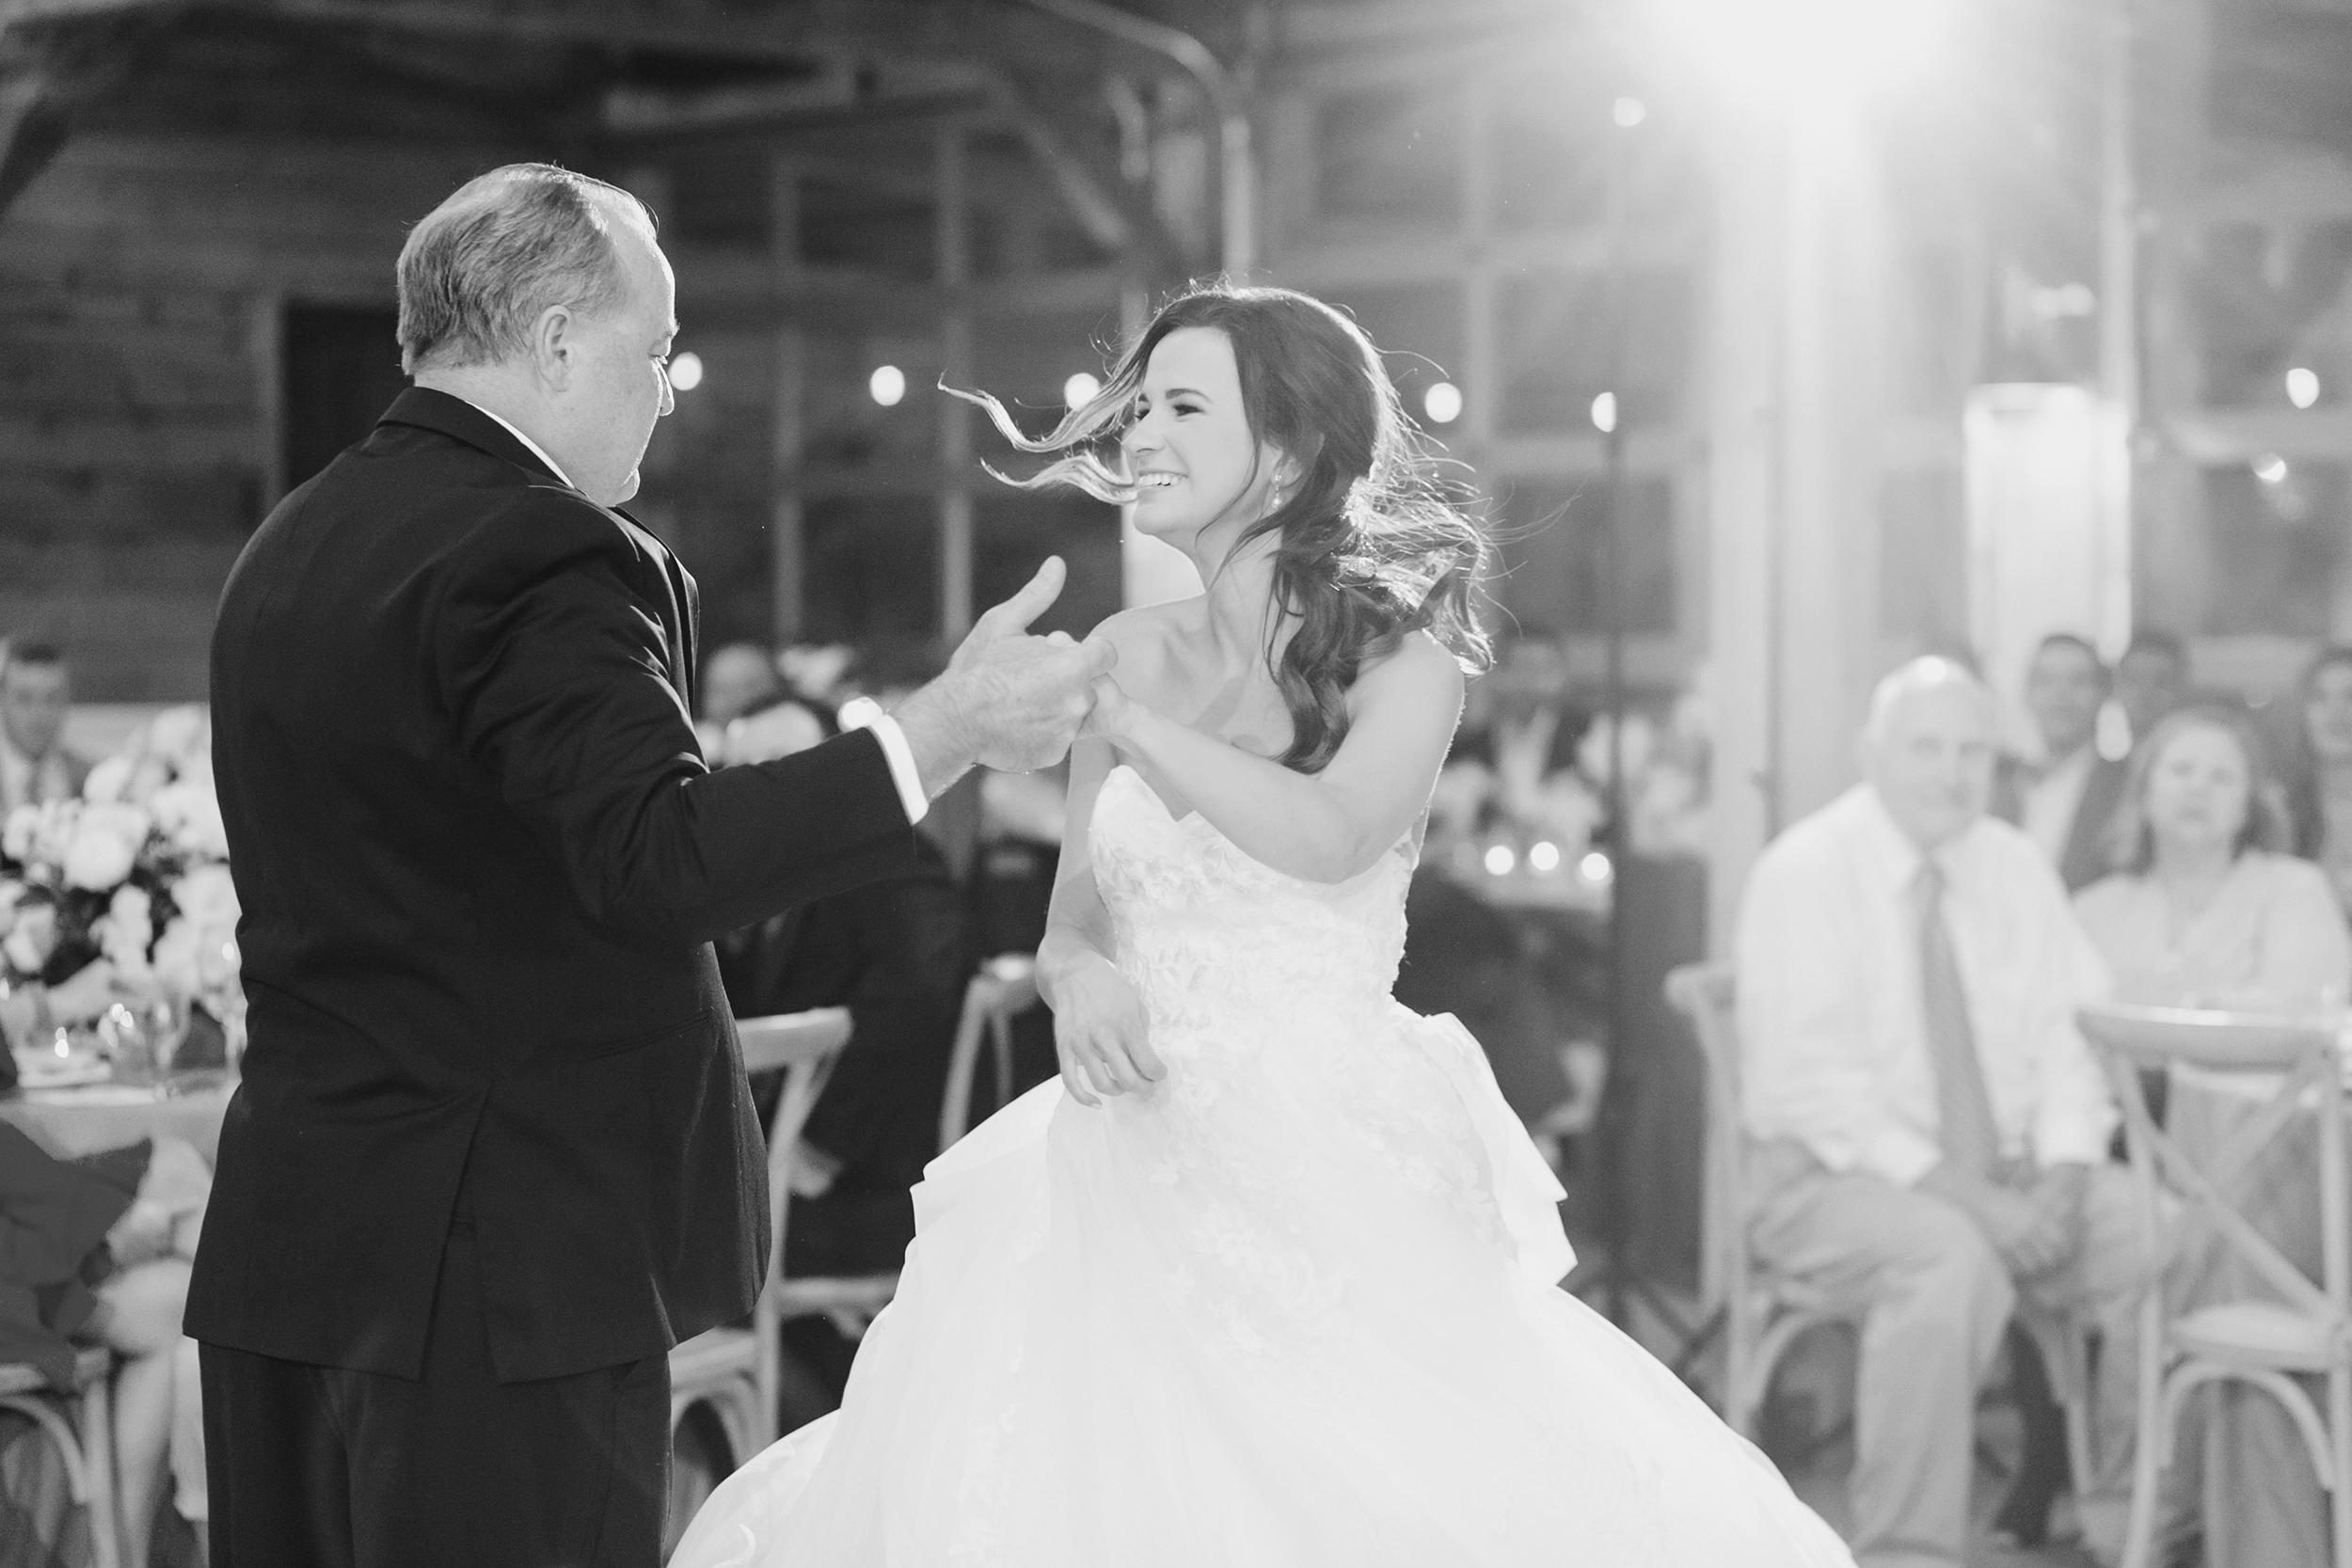 Austin_Wedding_Photographer_Kimberly_Brooke_Photographic_063.jpg